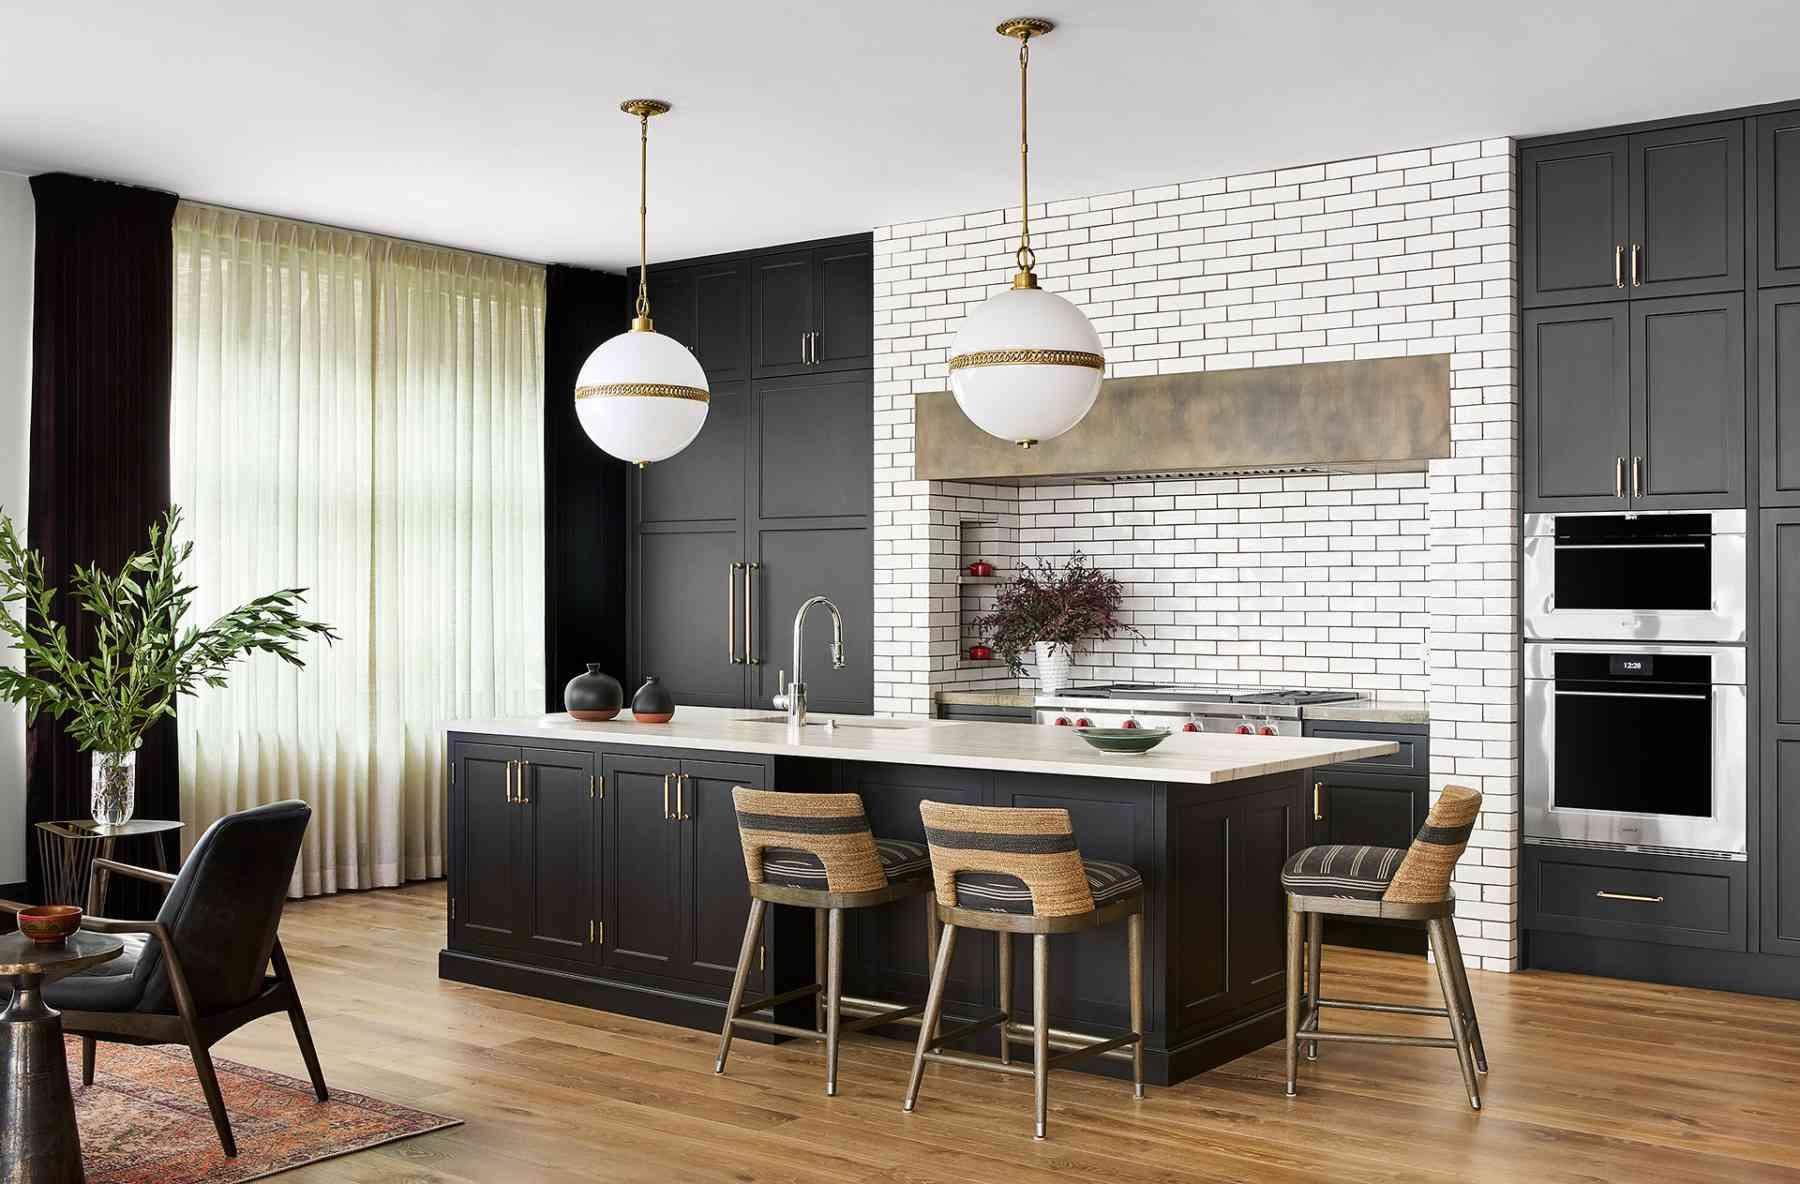 Minimalist kitchen with subway tile backsplash and brass hardware